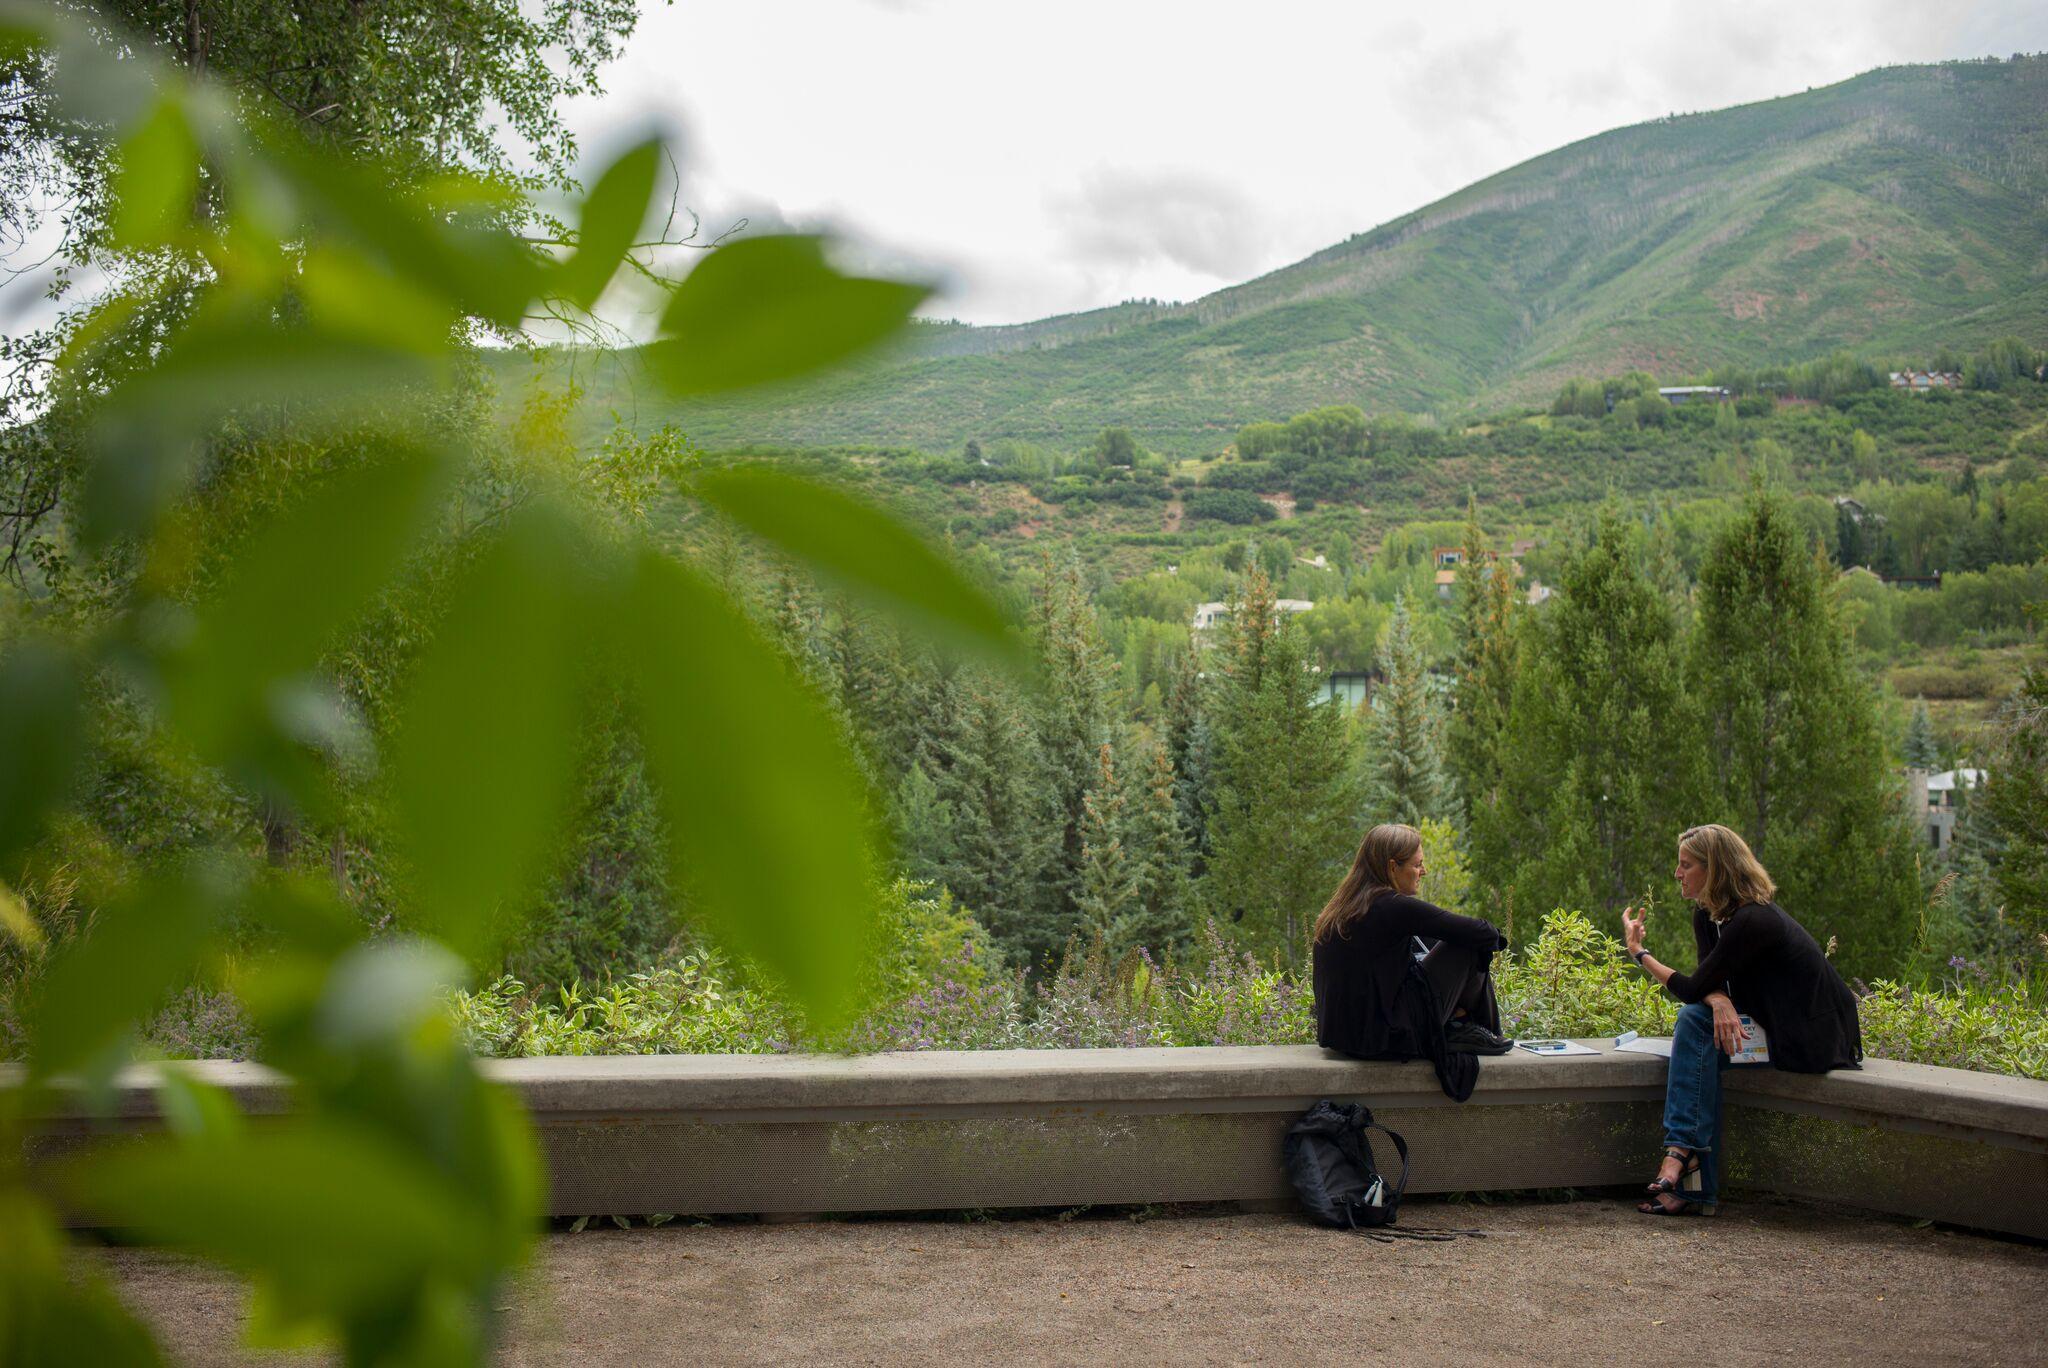 Taking the Aspen Seminar Home - Using the Aspen Seminar Method in your Daily Life